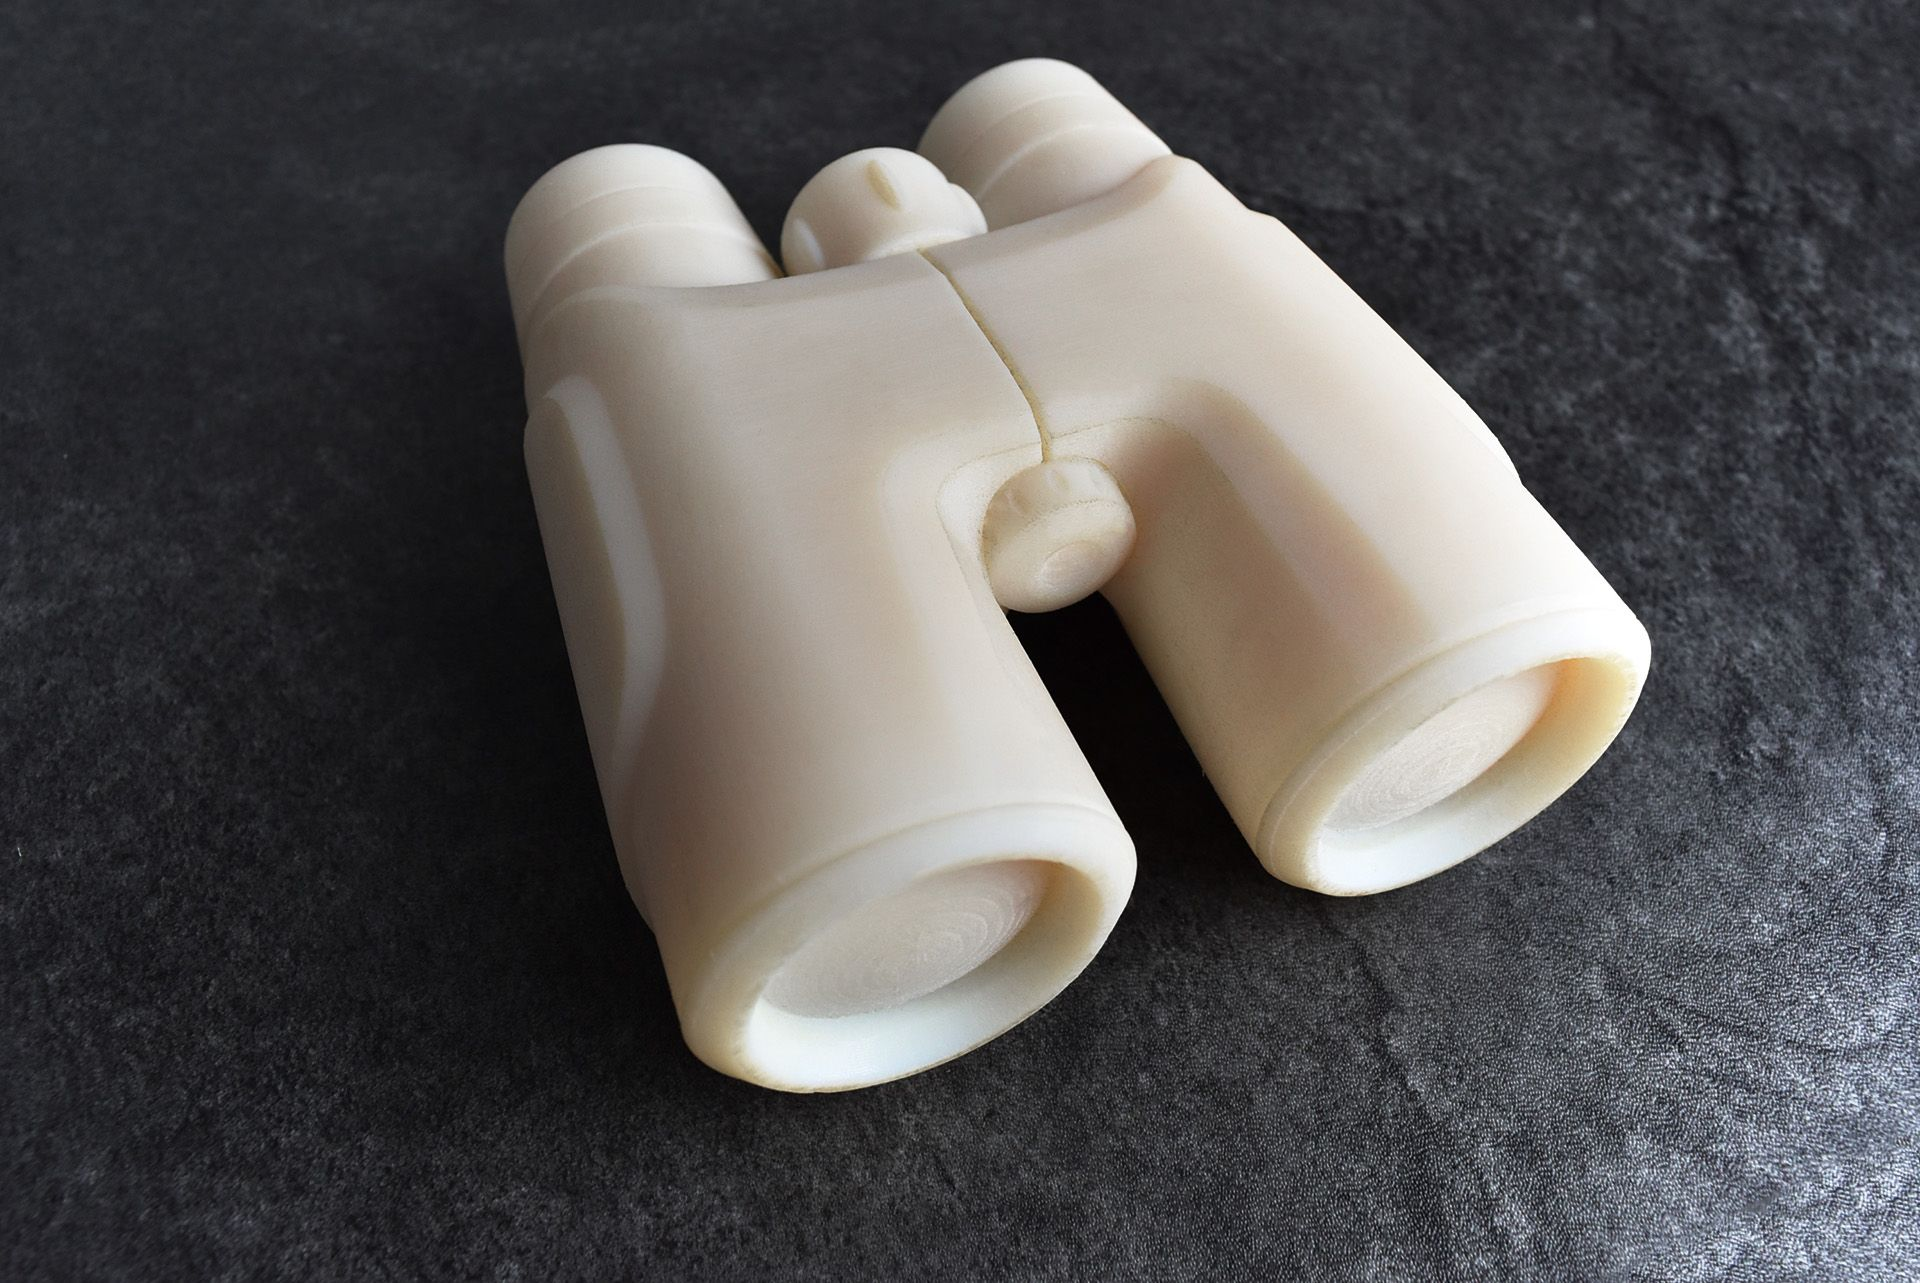 Binoculars - plastic prototype